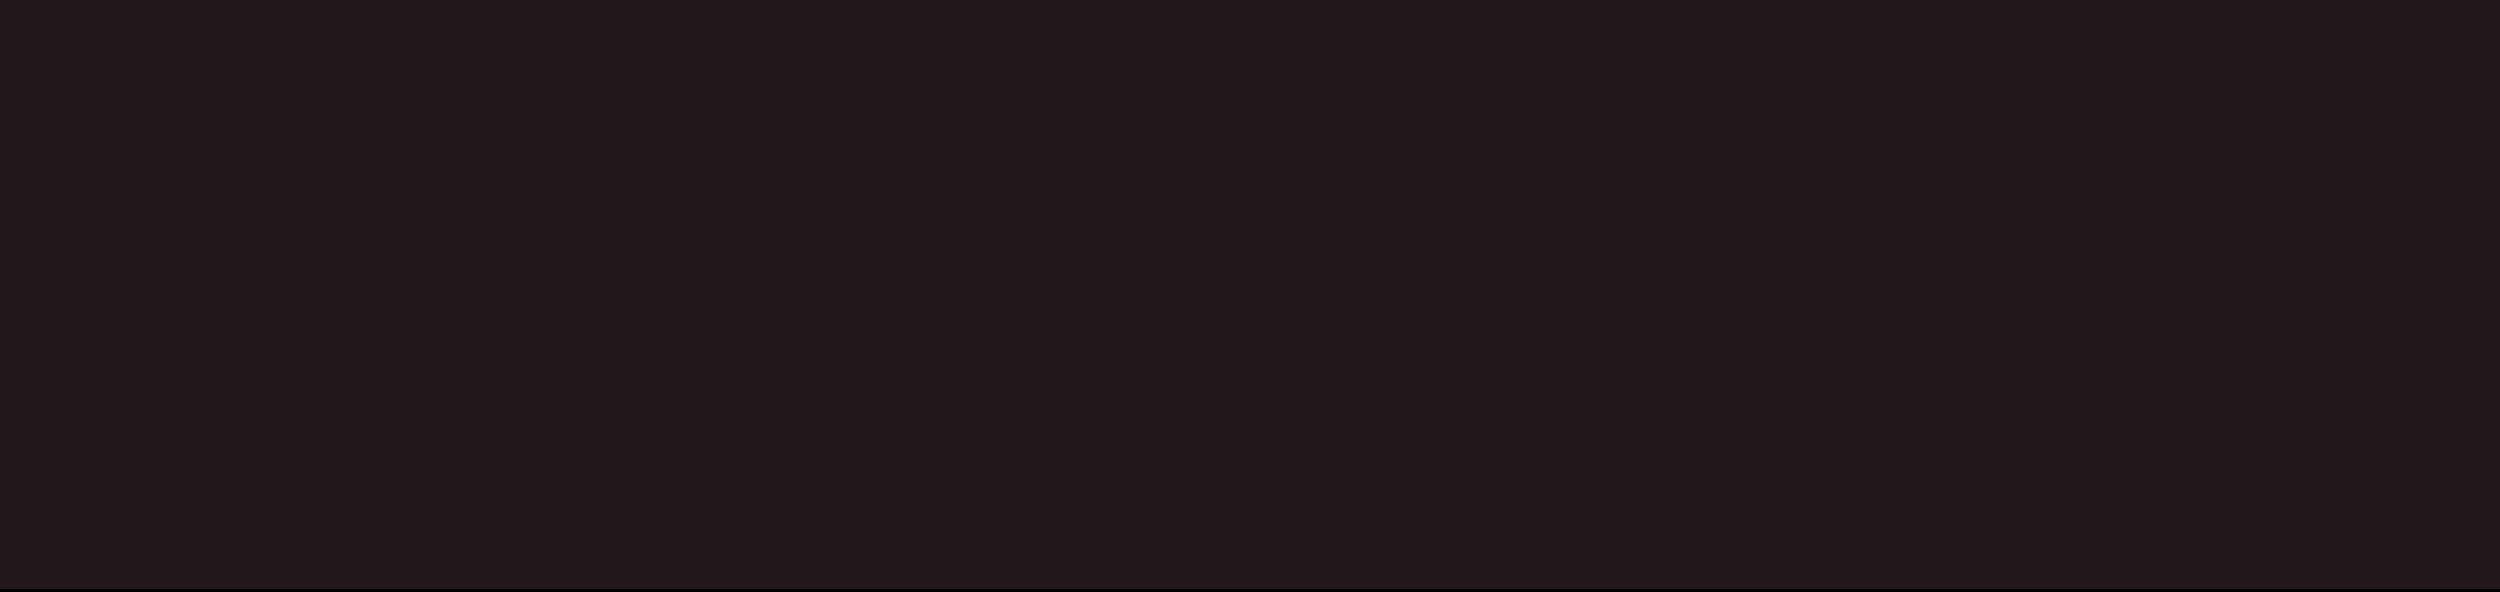 Carted logo